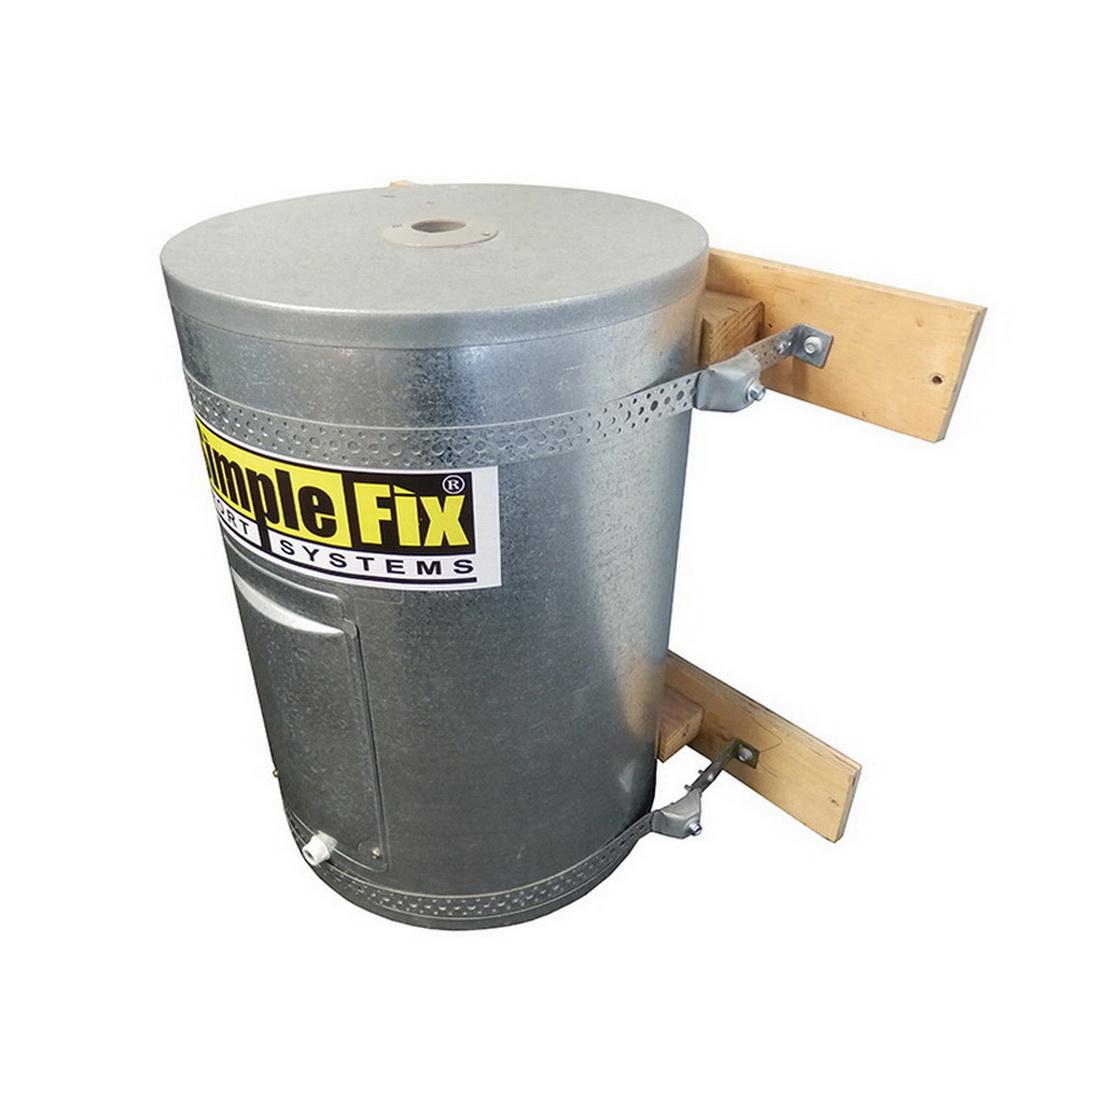 RSL SimpleFix 2 Strap Cylinder Restraint Kit SIMKIT